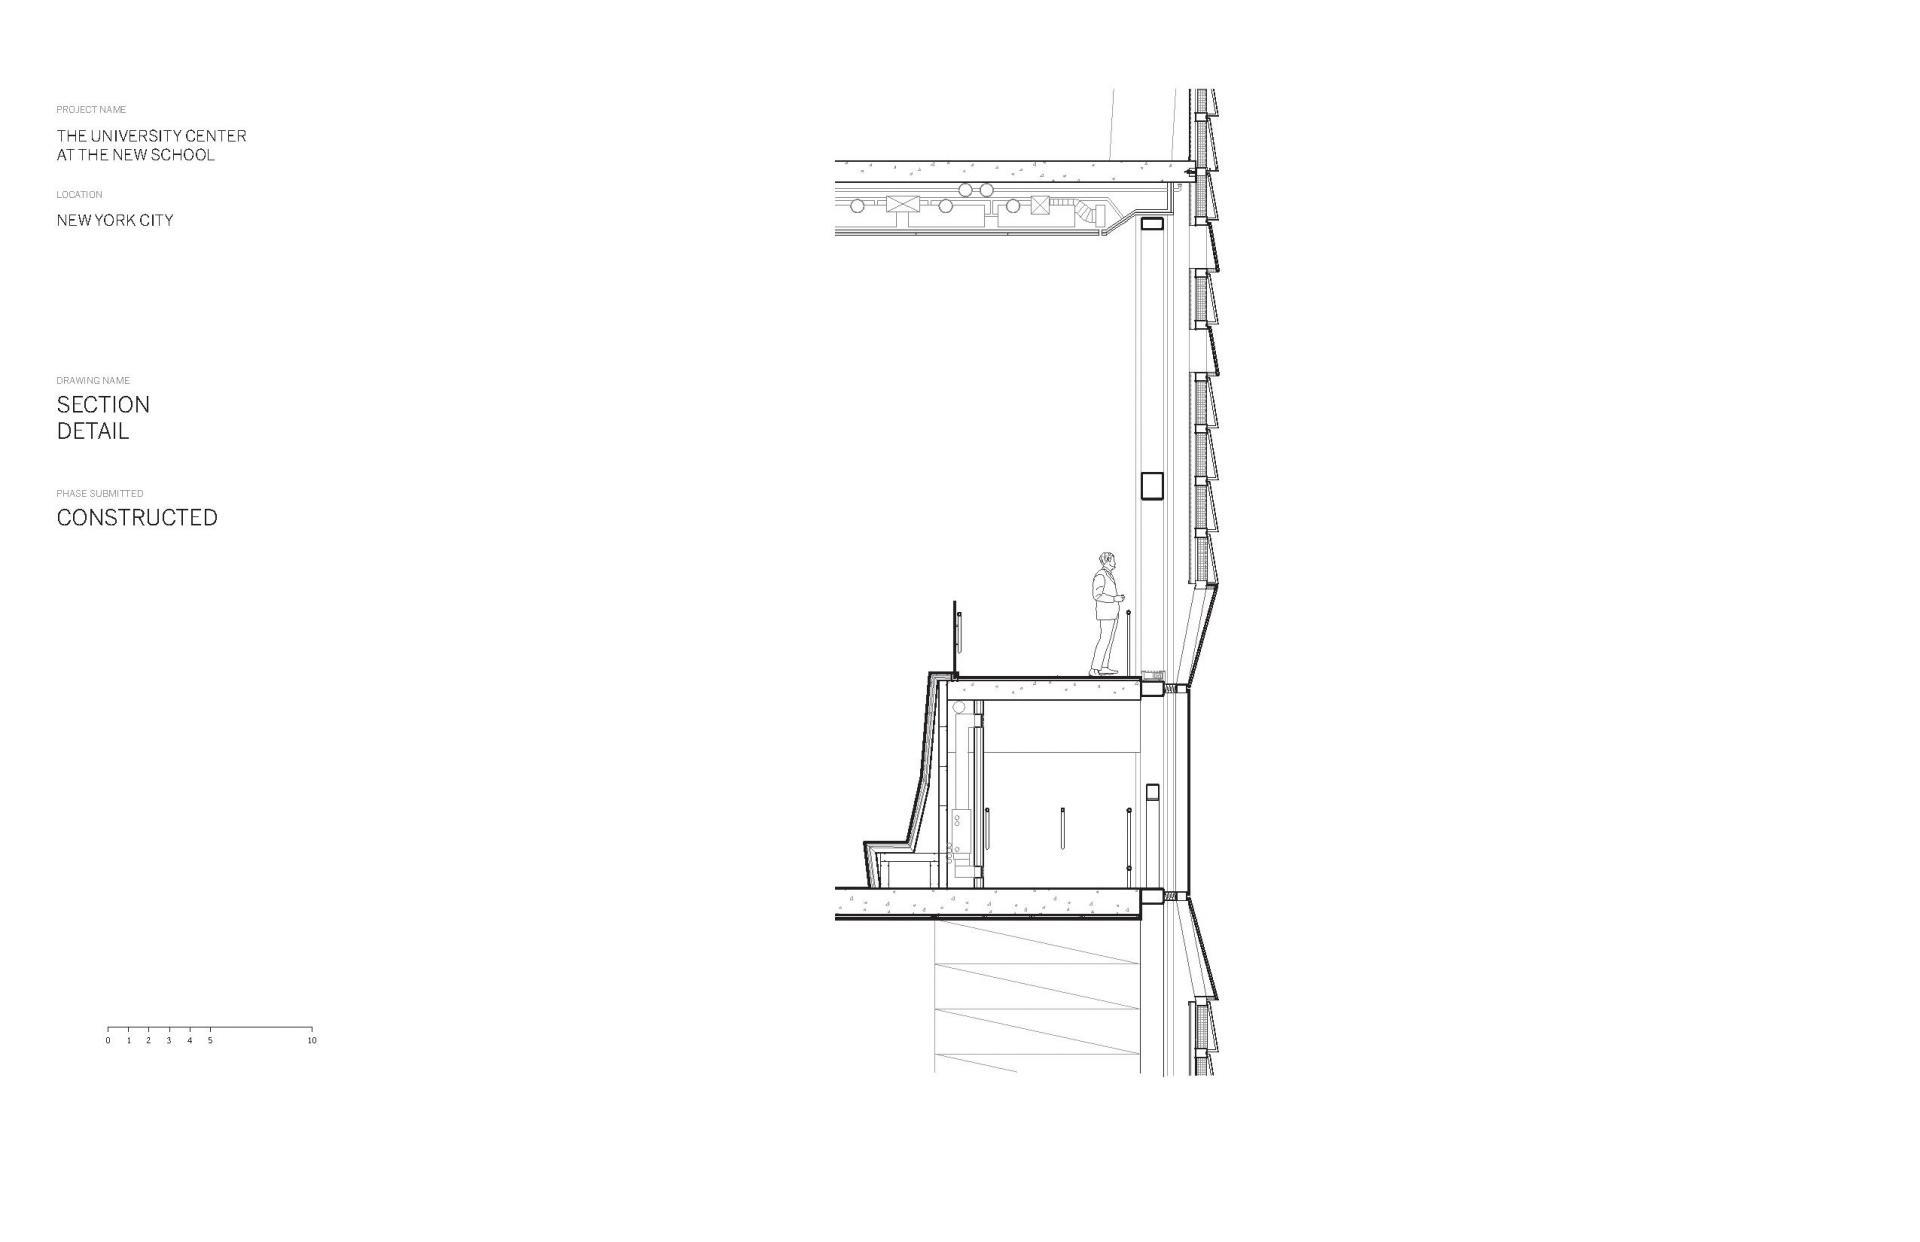 Схема учебного центра Greenwich Village в Нью Йорке - Фото 2